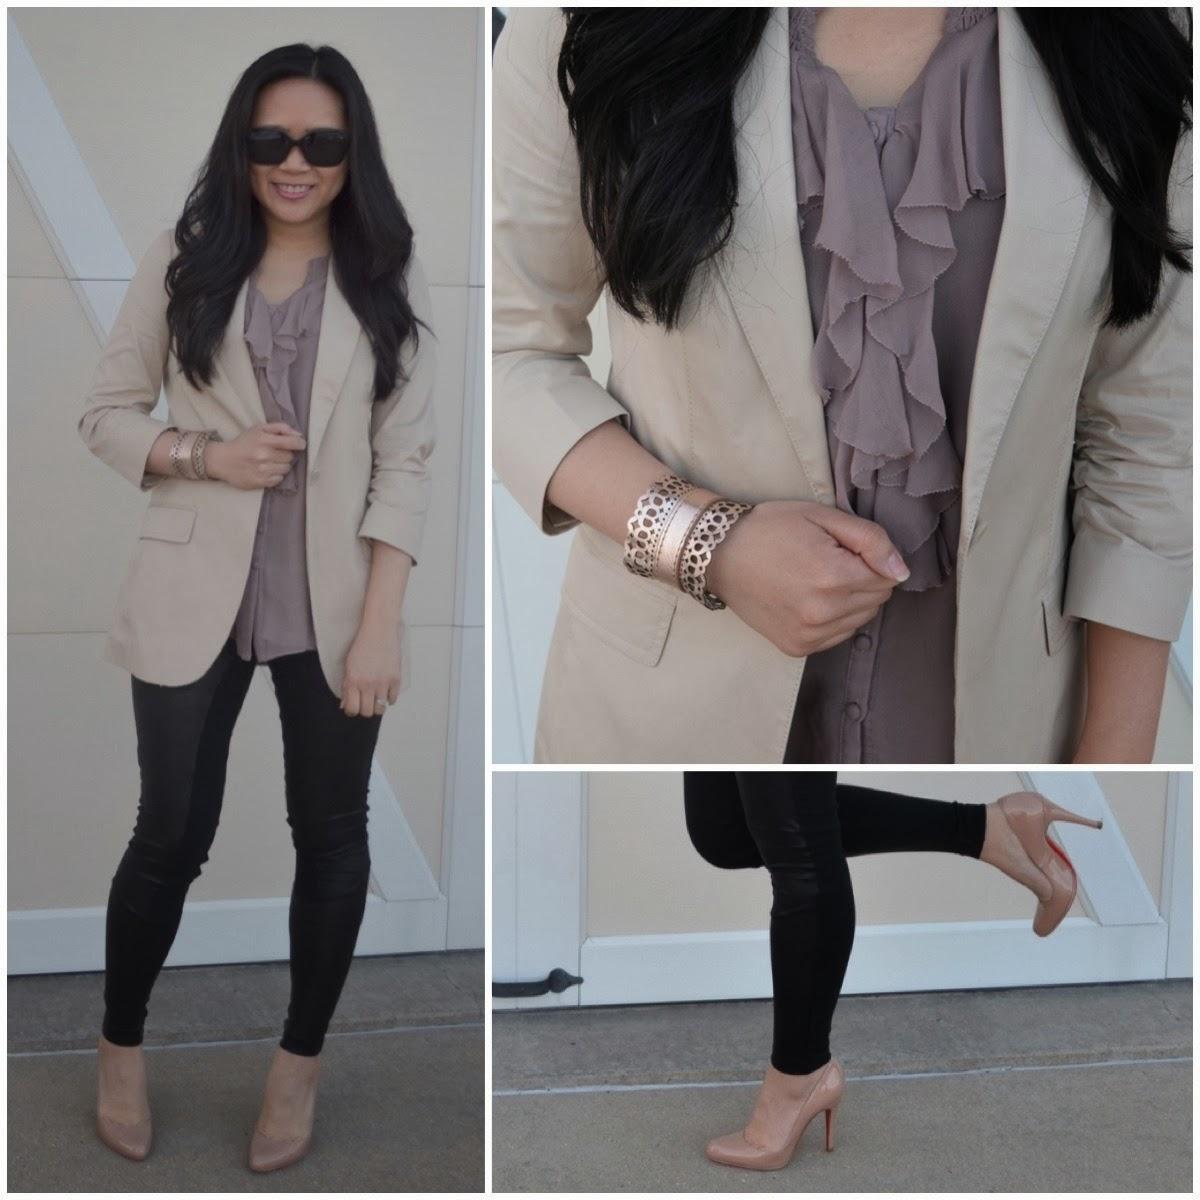 Express blazer, jacket, khaki, tan, beige, nude, minus the leather leggings, scuba leggings